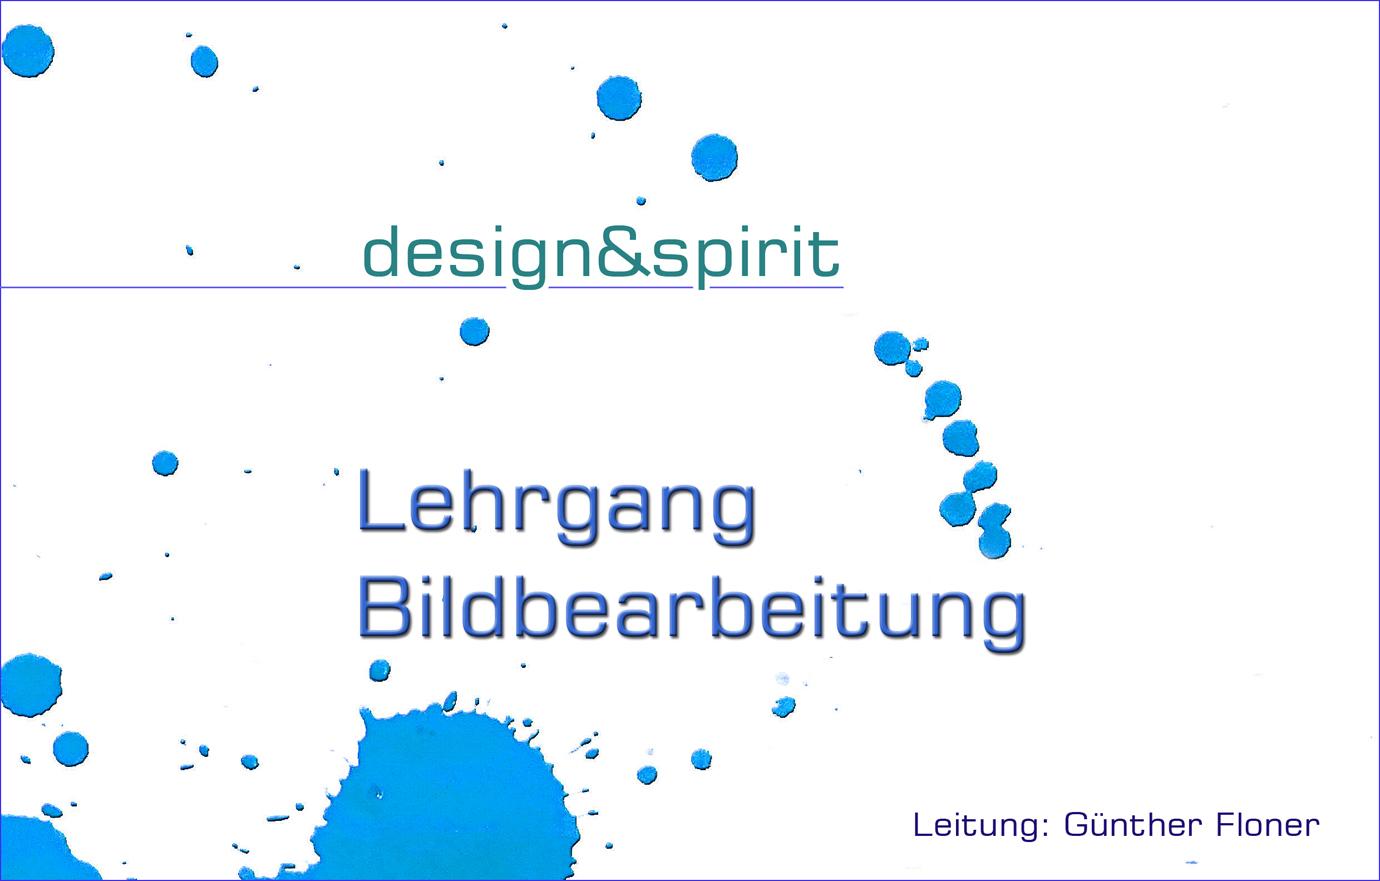 design und spirit - Lehrgang Bildbearbeitung